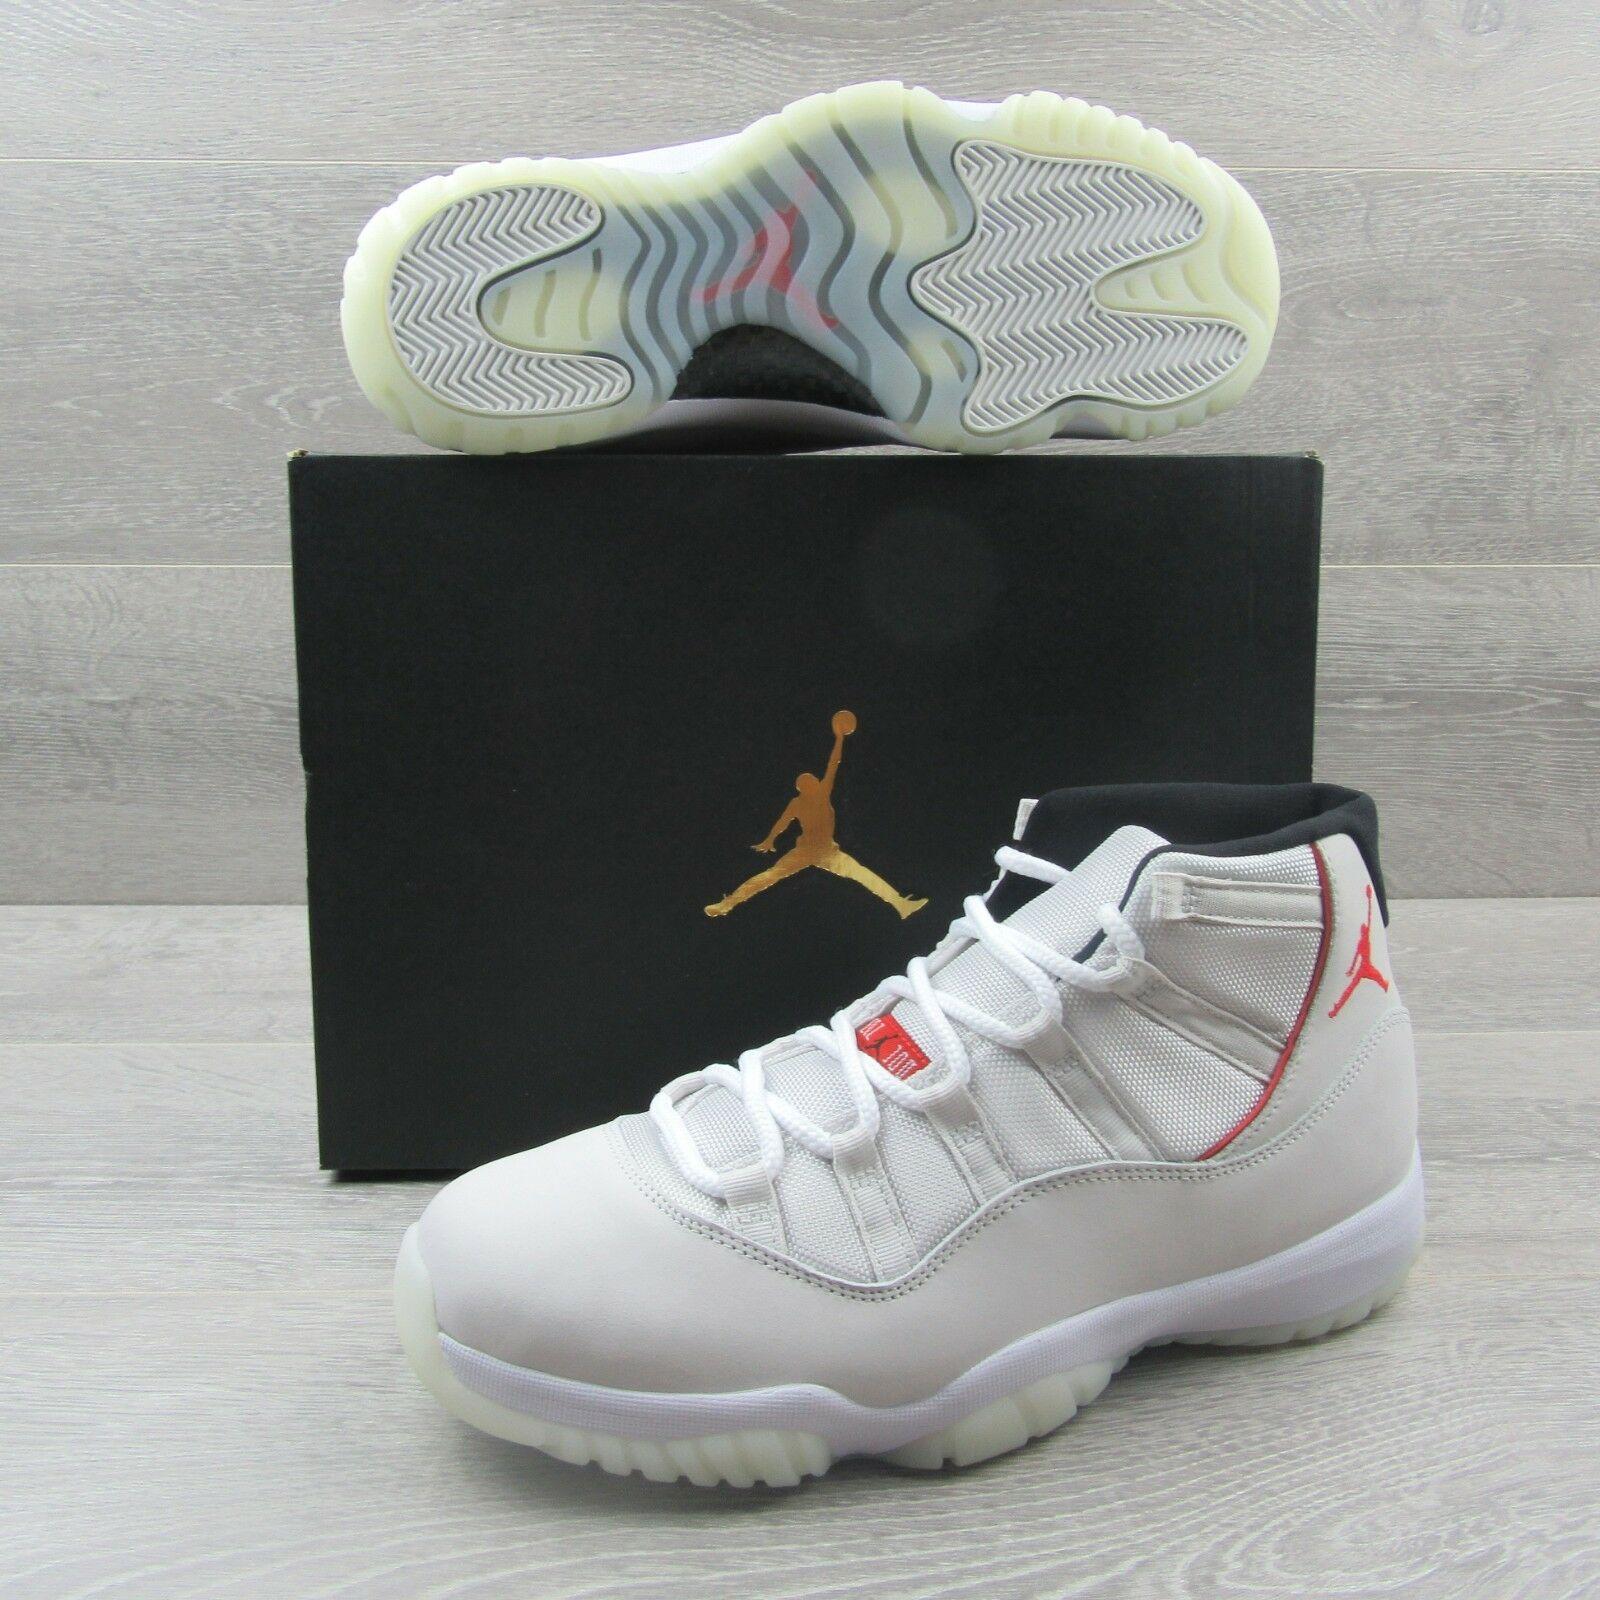 "cb85d49fdc5 Jordan Retro 11 XI ""Platinum Tint"" Mens Size 11 University Red 378037 016  New"